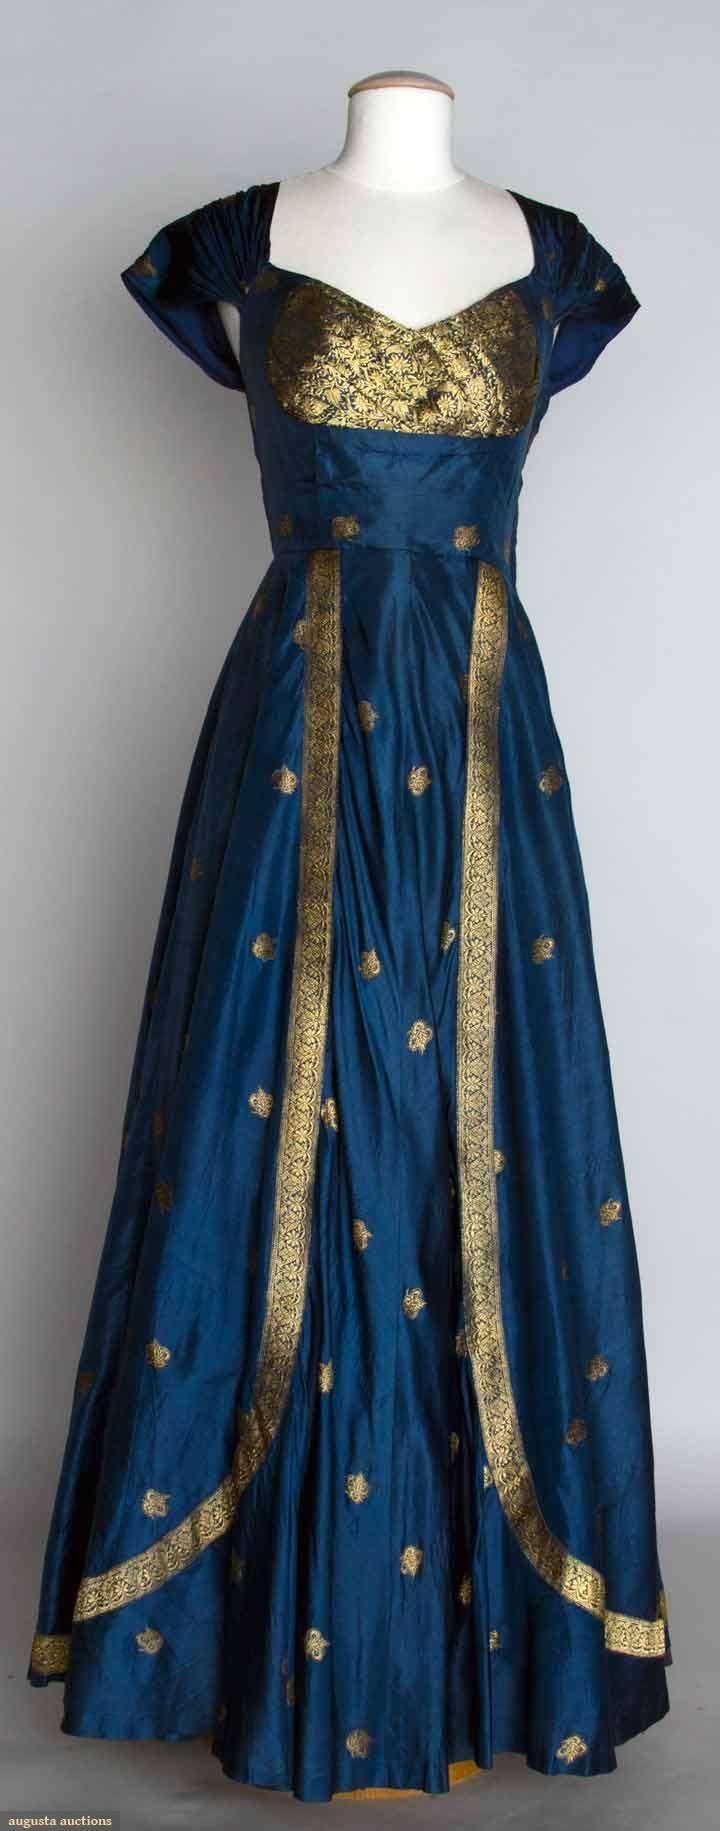 "BLUE & GOLD EVENING DRESS, 1950 Blue silk taffeta w/ metallic gold brocade, fashioned from Indian sari, B 33"", W 27.5"", L 60"", excellent."